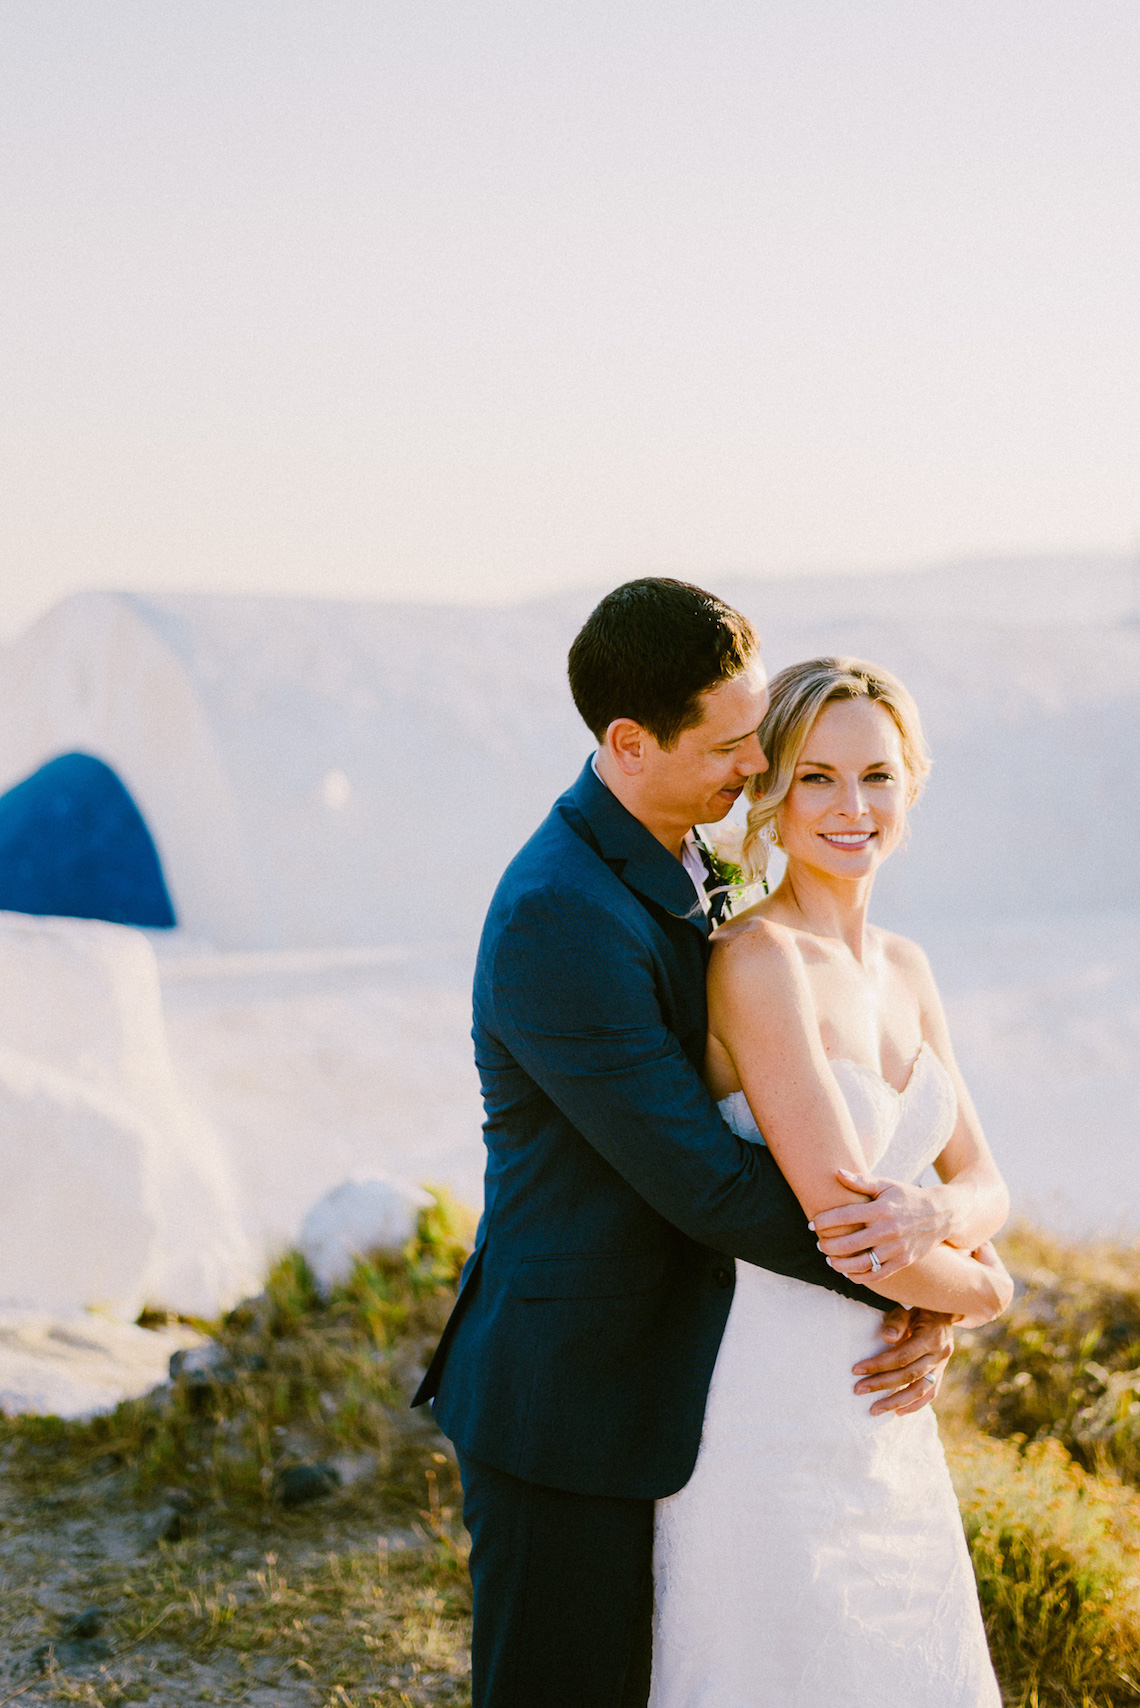 Classy Santorini Destination Wedding (With Amazing Caldera Views!) | Elias Kordelakos 19